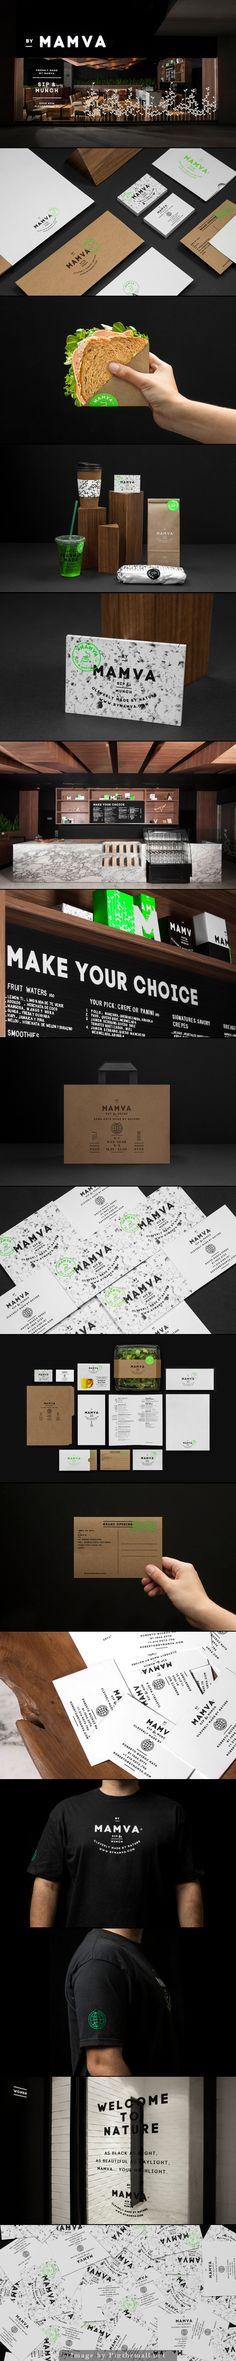 Mamva branding corporate identity stationary logo letterhead business card enveloppe minimal graphic design kraft paper texture packaging eat & drink menu type typography